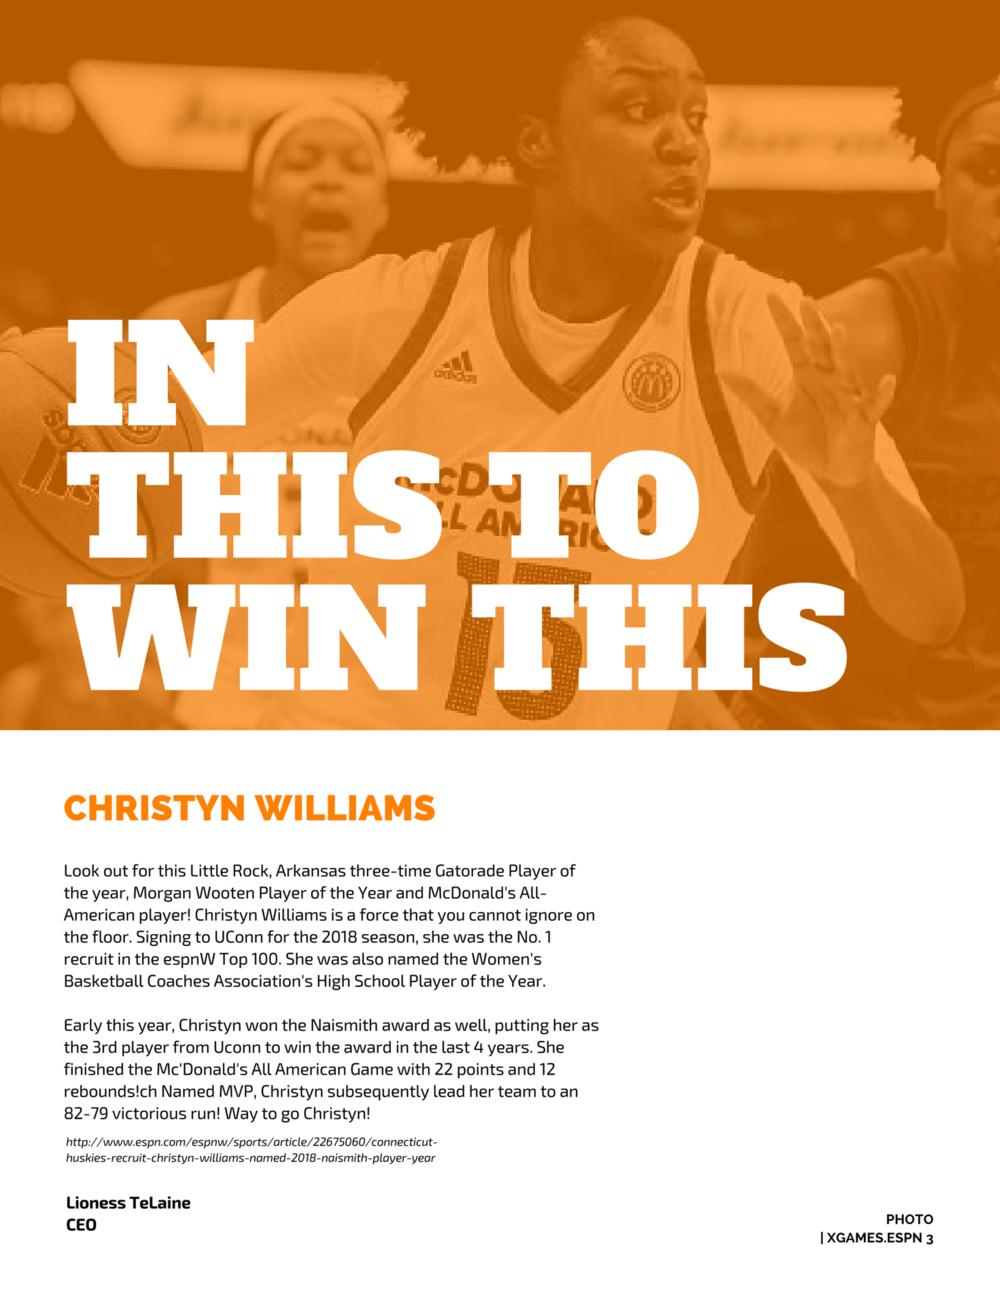 Follow Christyn Williams on Twitter -